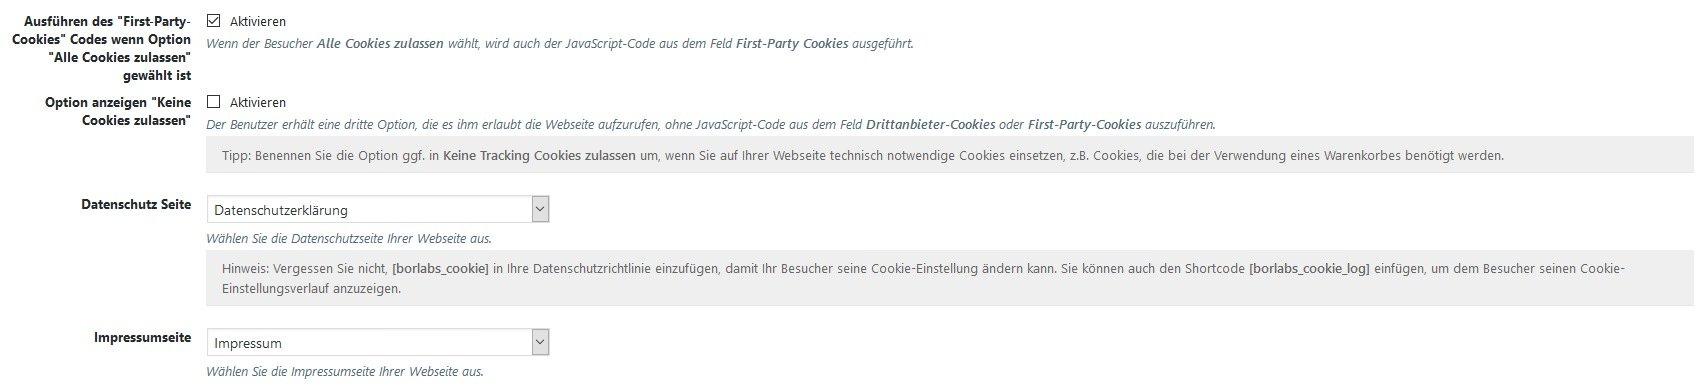 Ausführung von Drittanbieter-Cookies sowie First-Party-Cookies in Borlabs Cookie